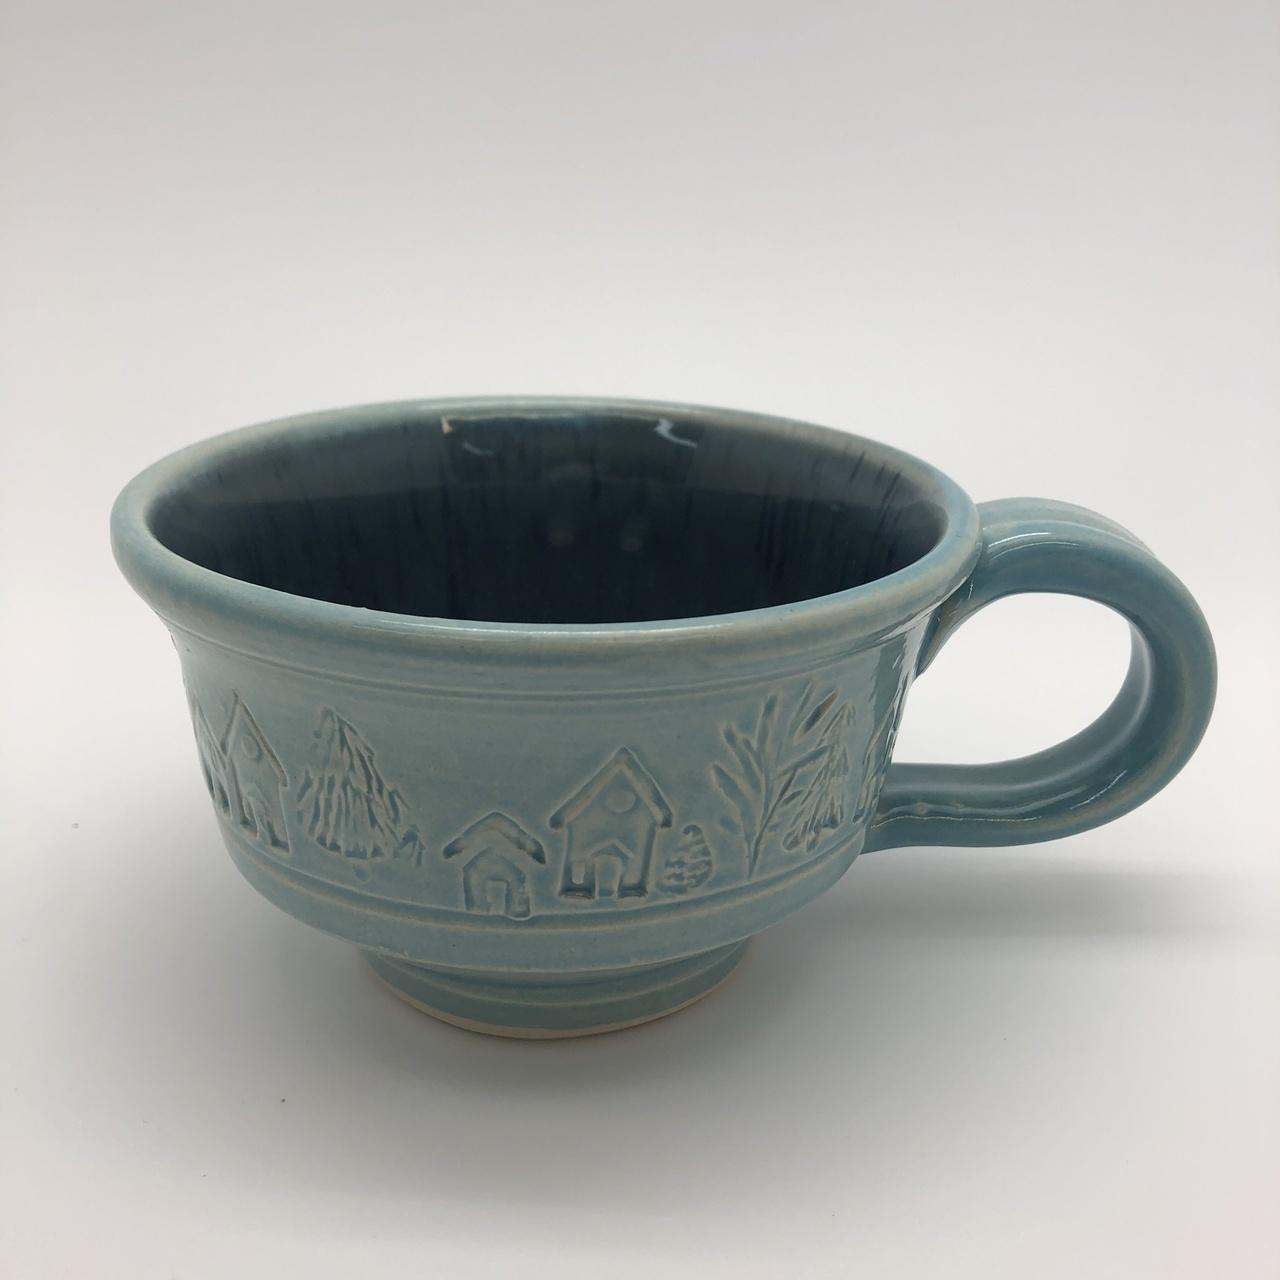 Light Blue House Mug